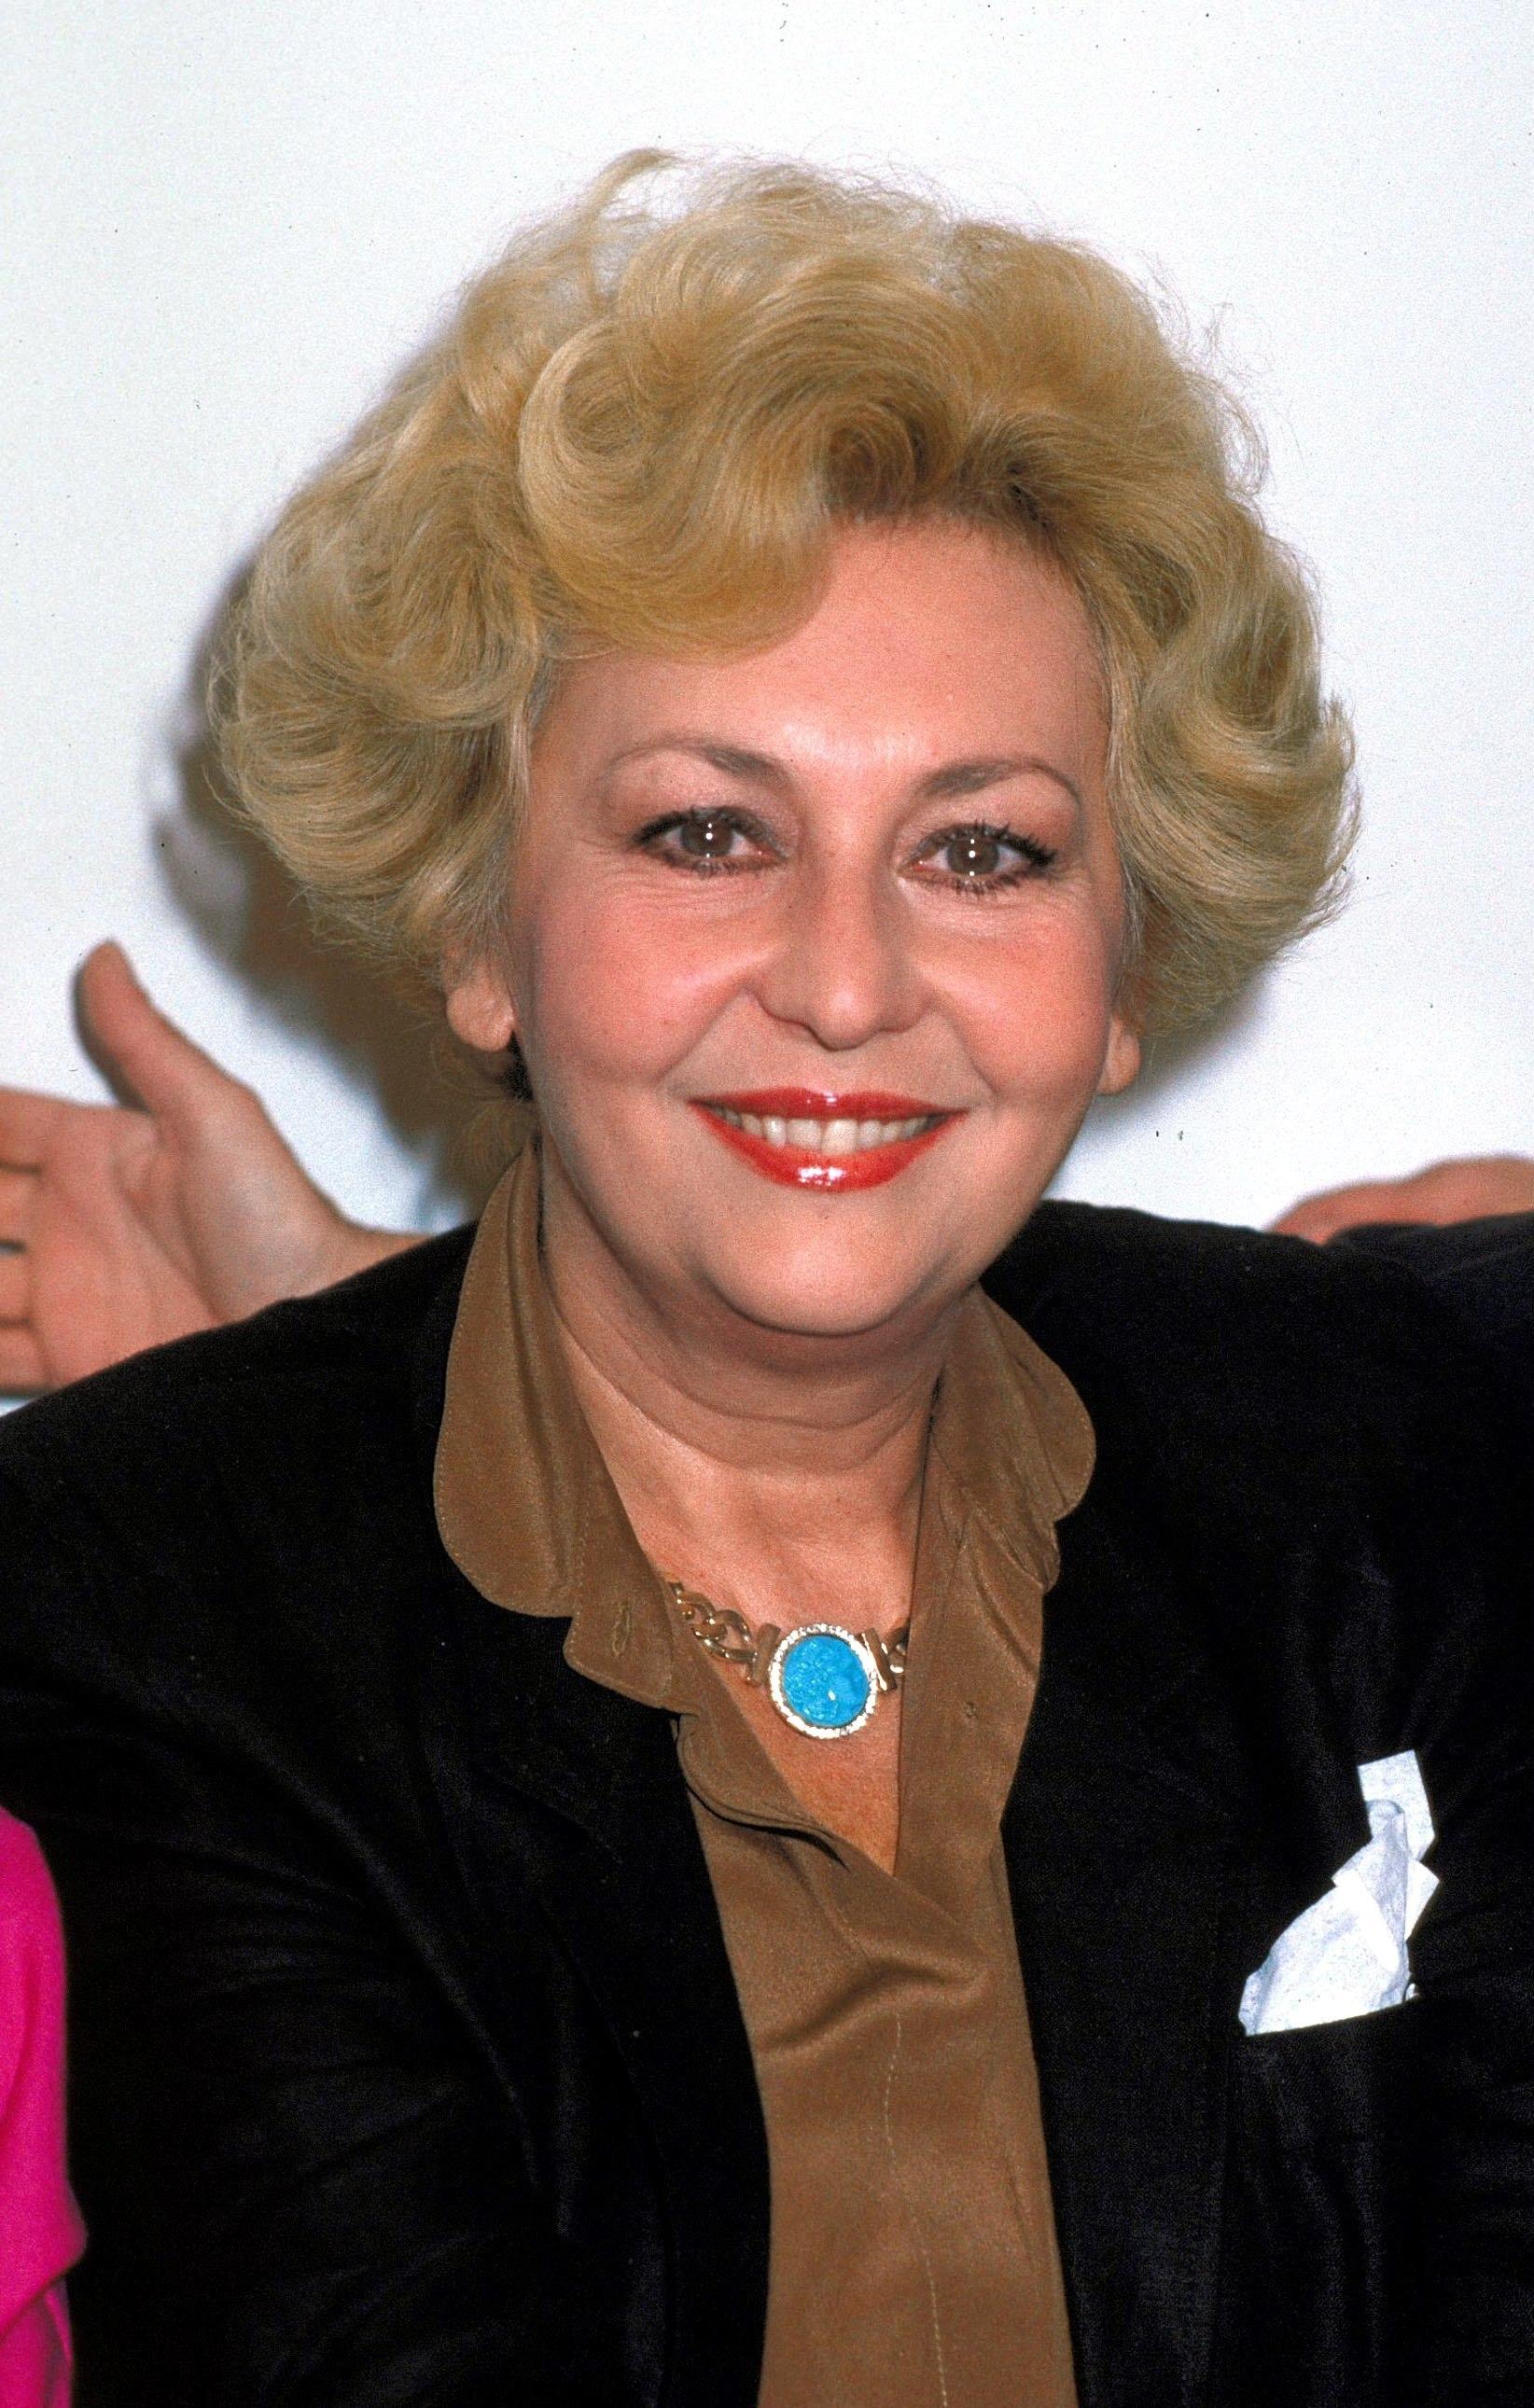 Morta Anna Maria Gambineri, storica signorina buonasera